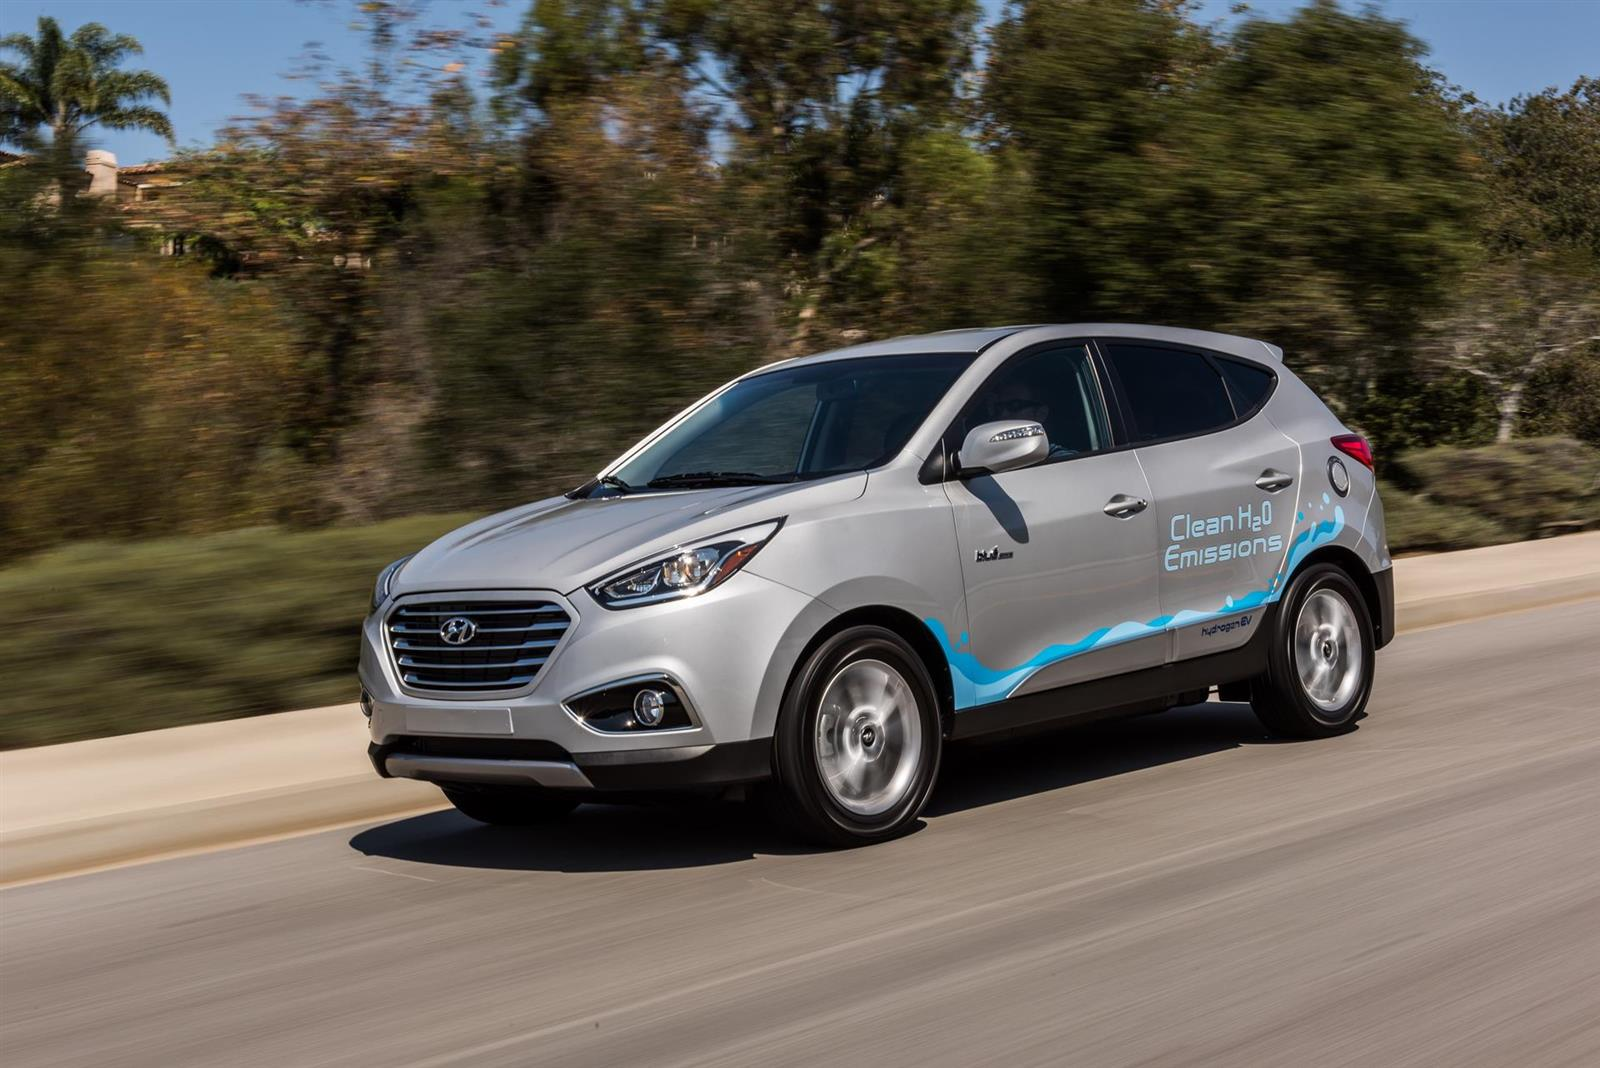 2016 Hyundai Tucson Fuel Cell Image. Photo 1 of 24